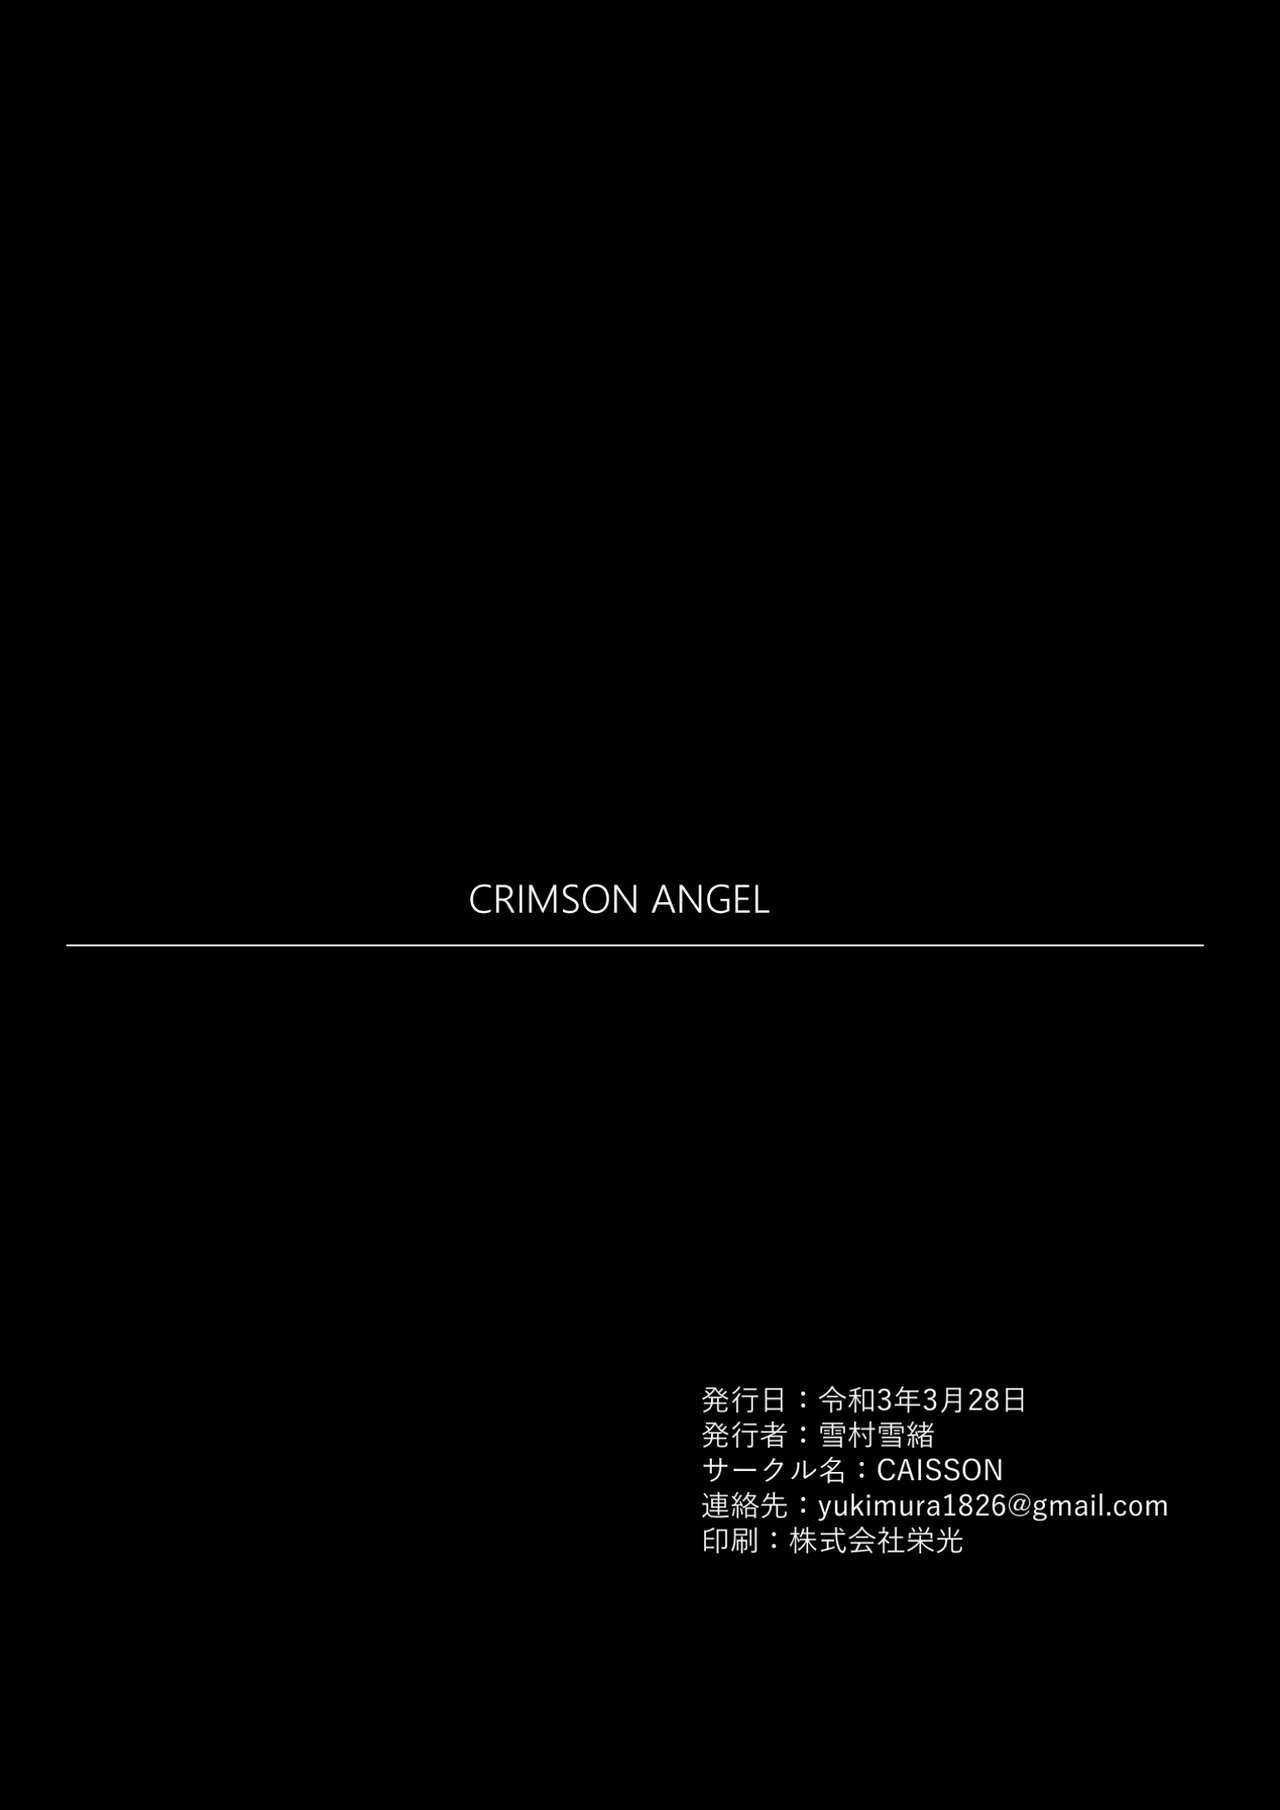 CRIMSON ANGEL 47